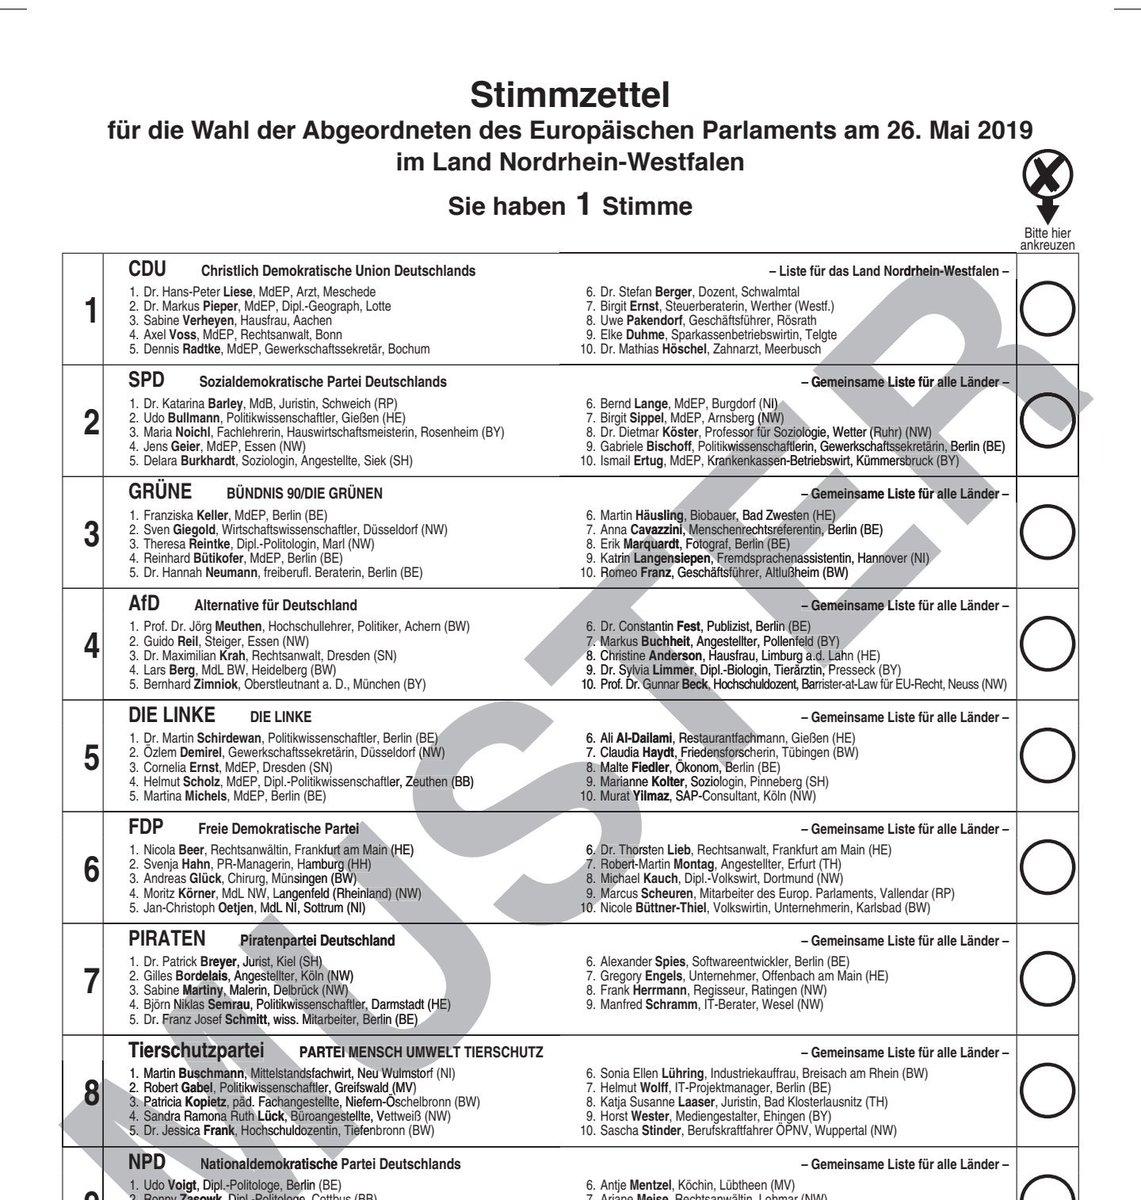 Sandra Luck On Twitter Muster Wahlzettel Zur Europawahl2019 Am 26 Mai Mitgefuhlwahlen Tierschutzpartei Eu Europawahl Europa Tierschutz Animalpoliticseu Gehtwaehlen Https T Co 0wowkb5gkw